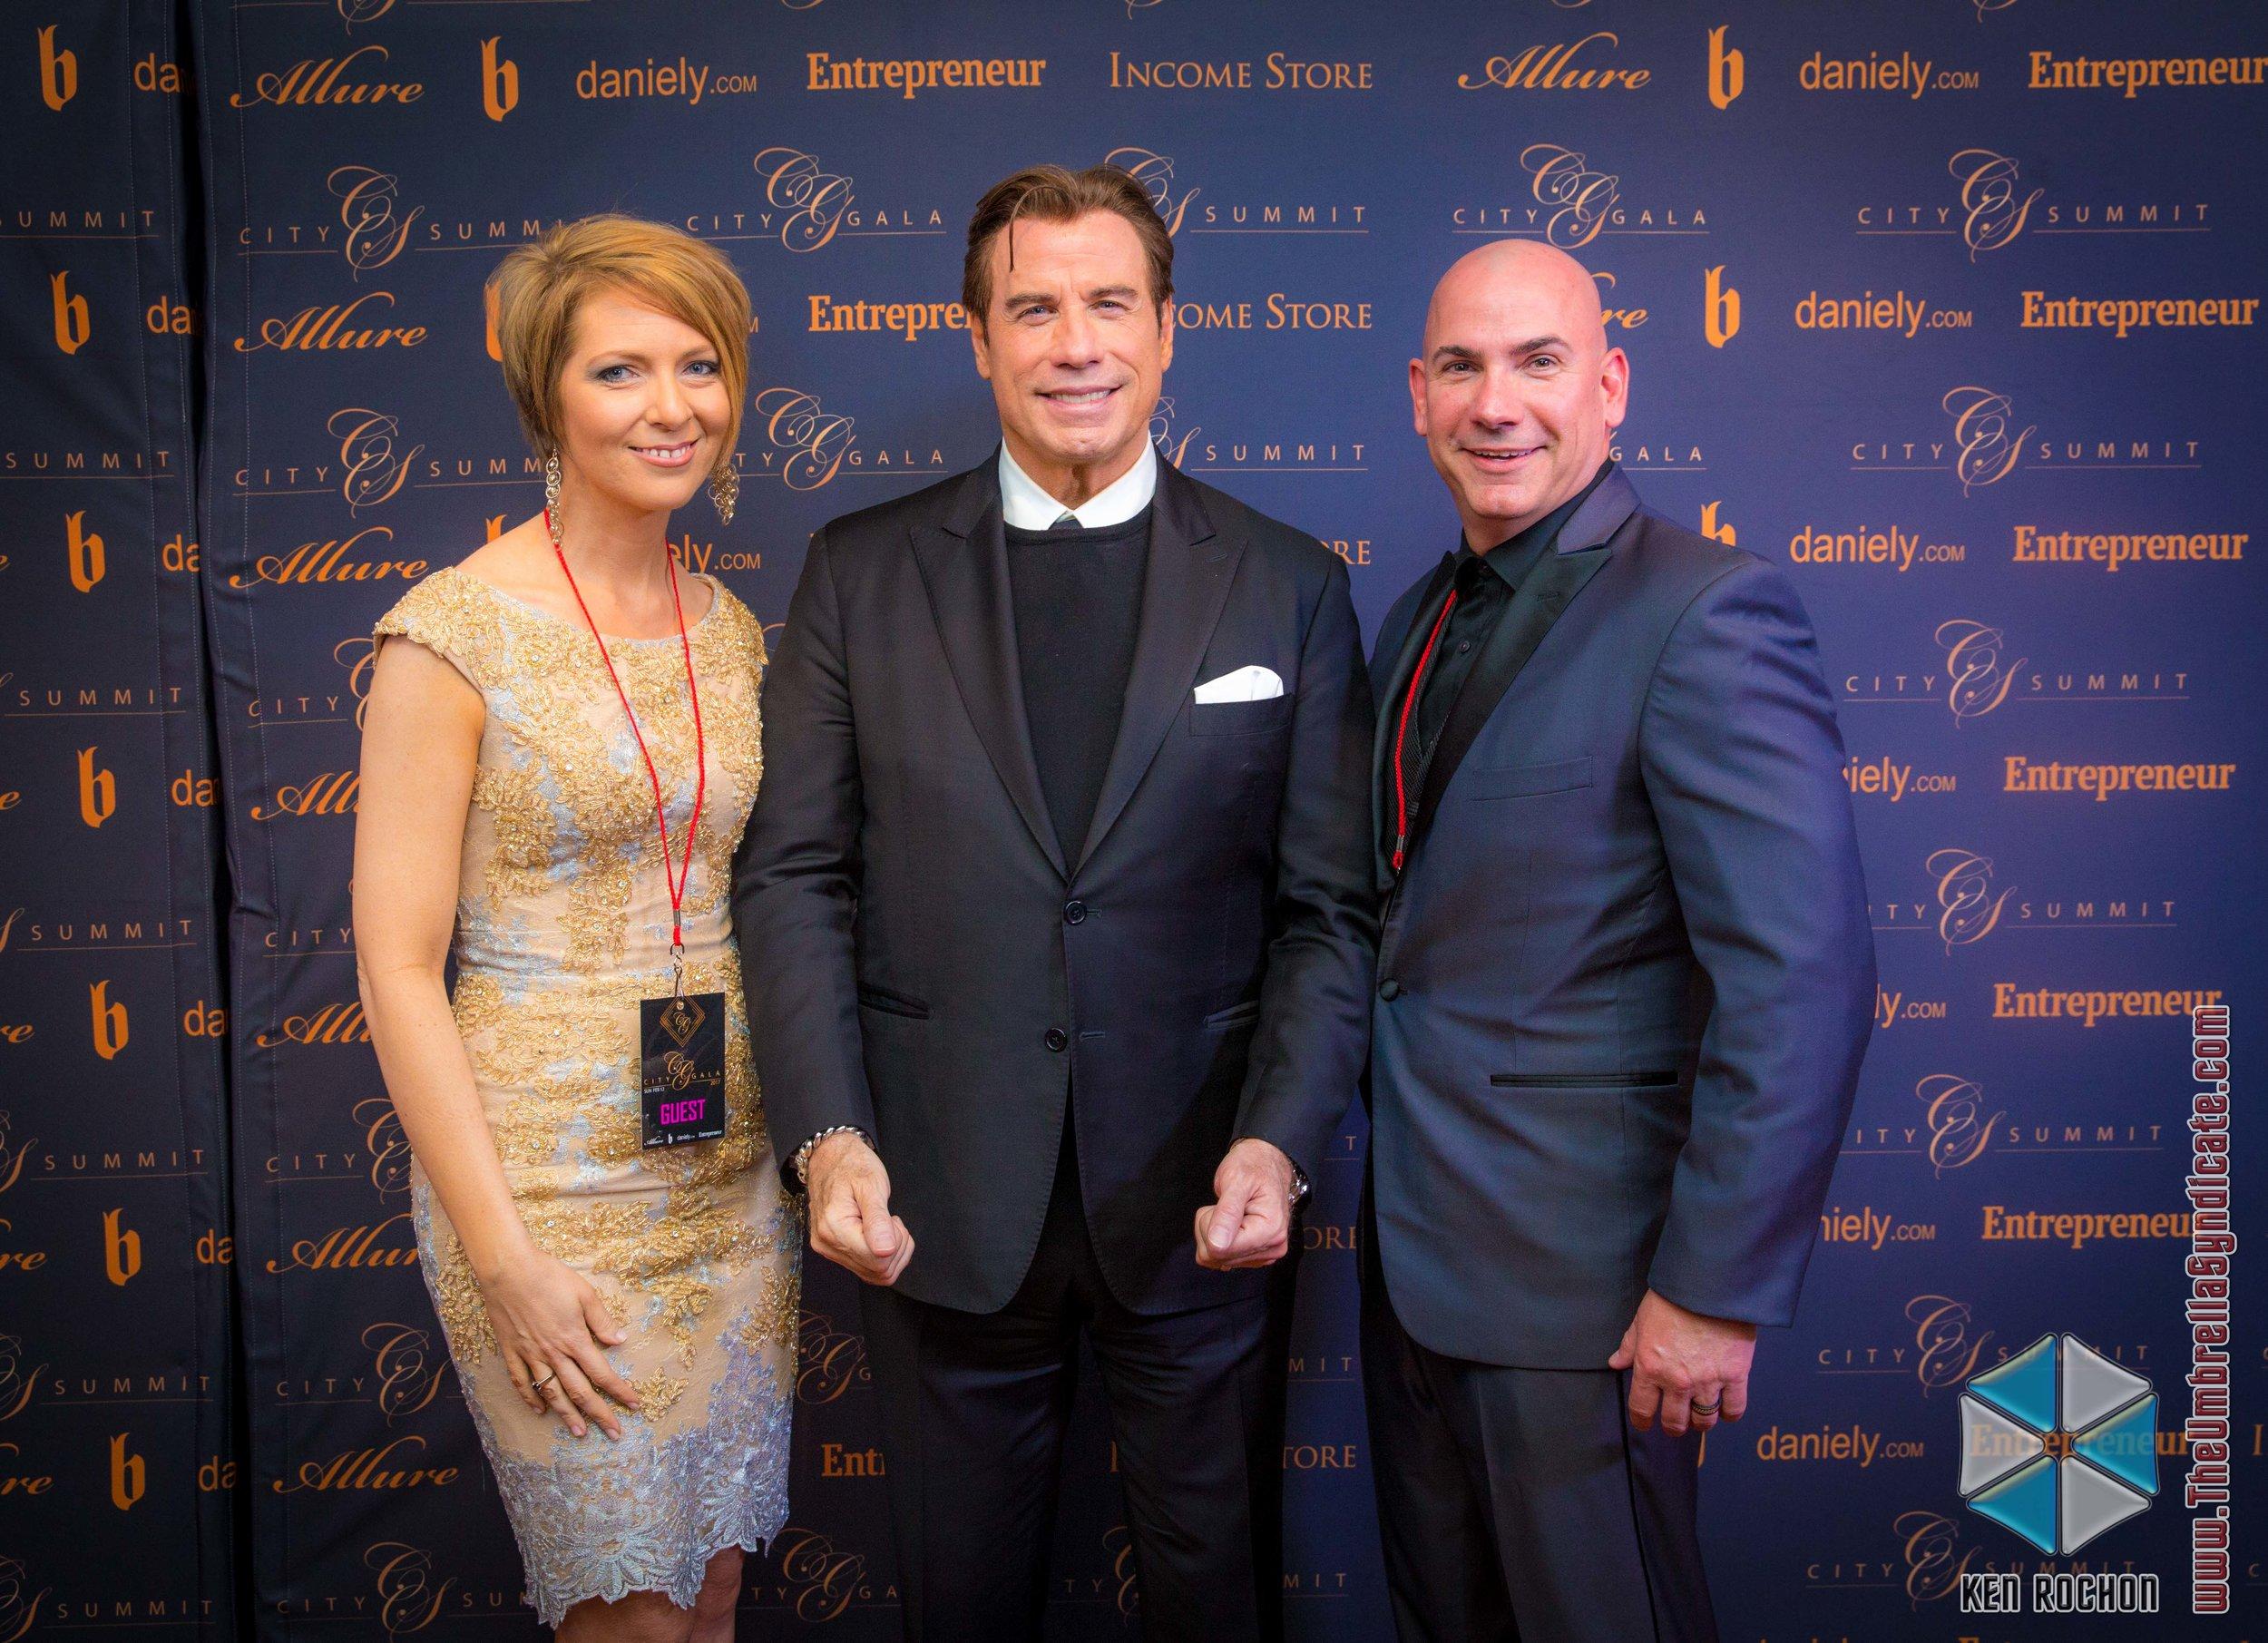 - John Travolta wth Ed and Erica Castner - City Gala - Los Angles, CA. Photo: Ken Rochon - The Umbrella Syndicate